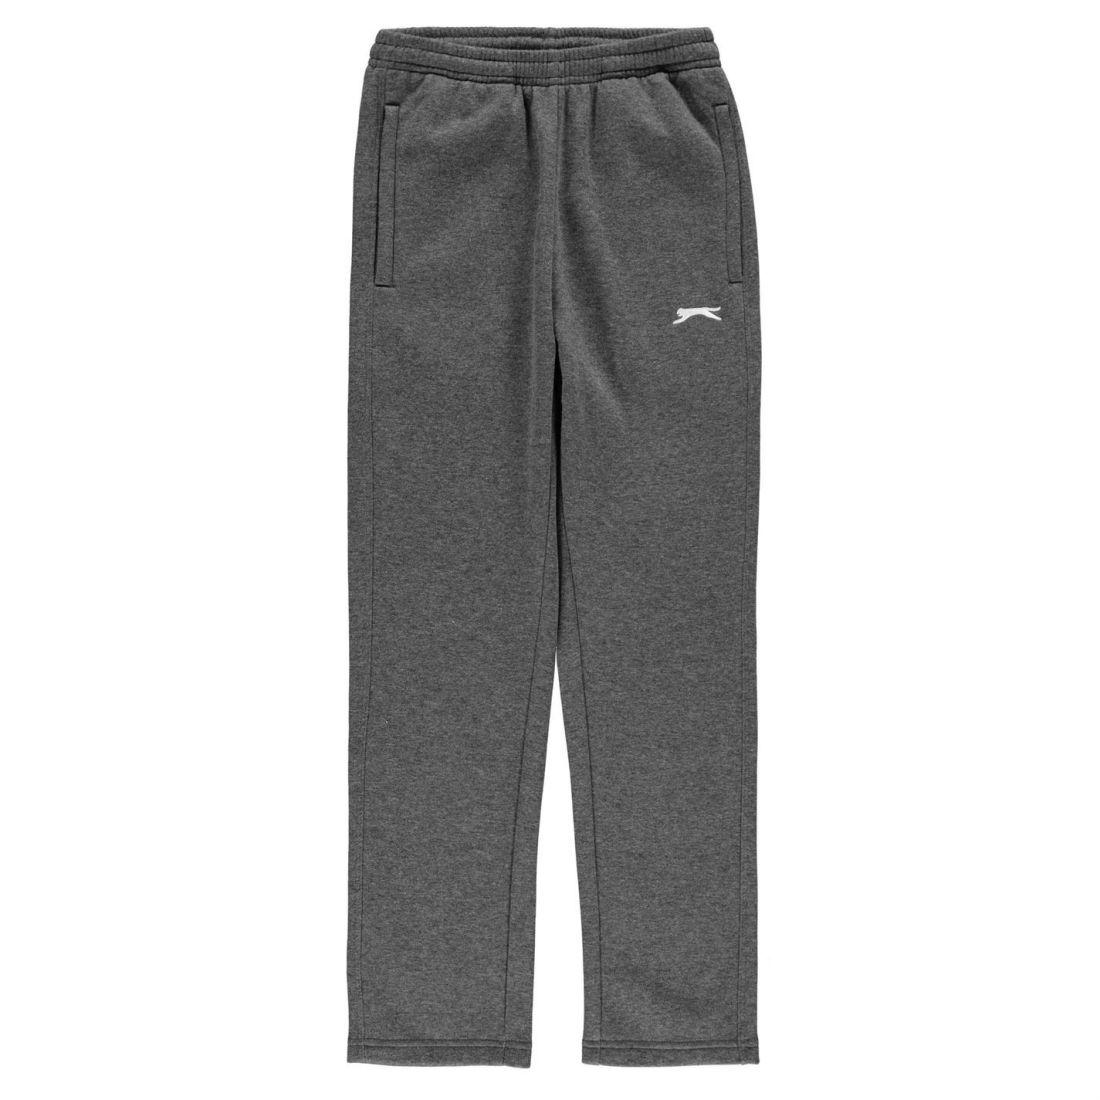 9cbcca161765 Slazenger Kids Boys Open Hem Fleece Pants Junior Jogging Bottoms Trousers